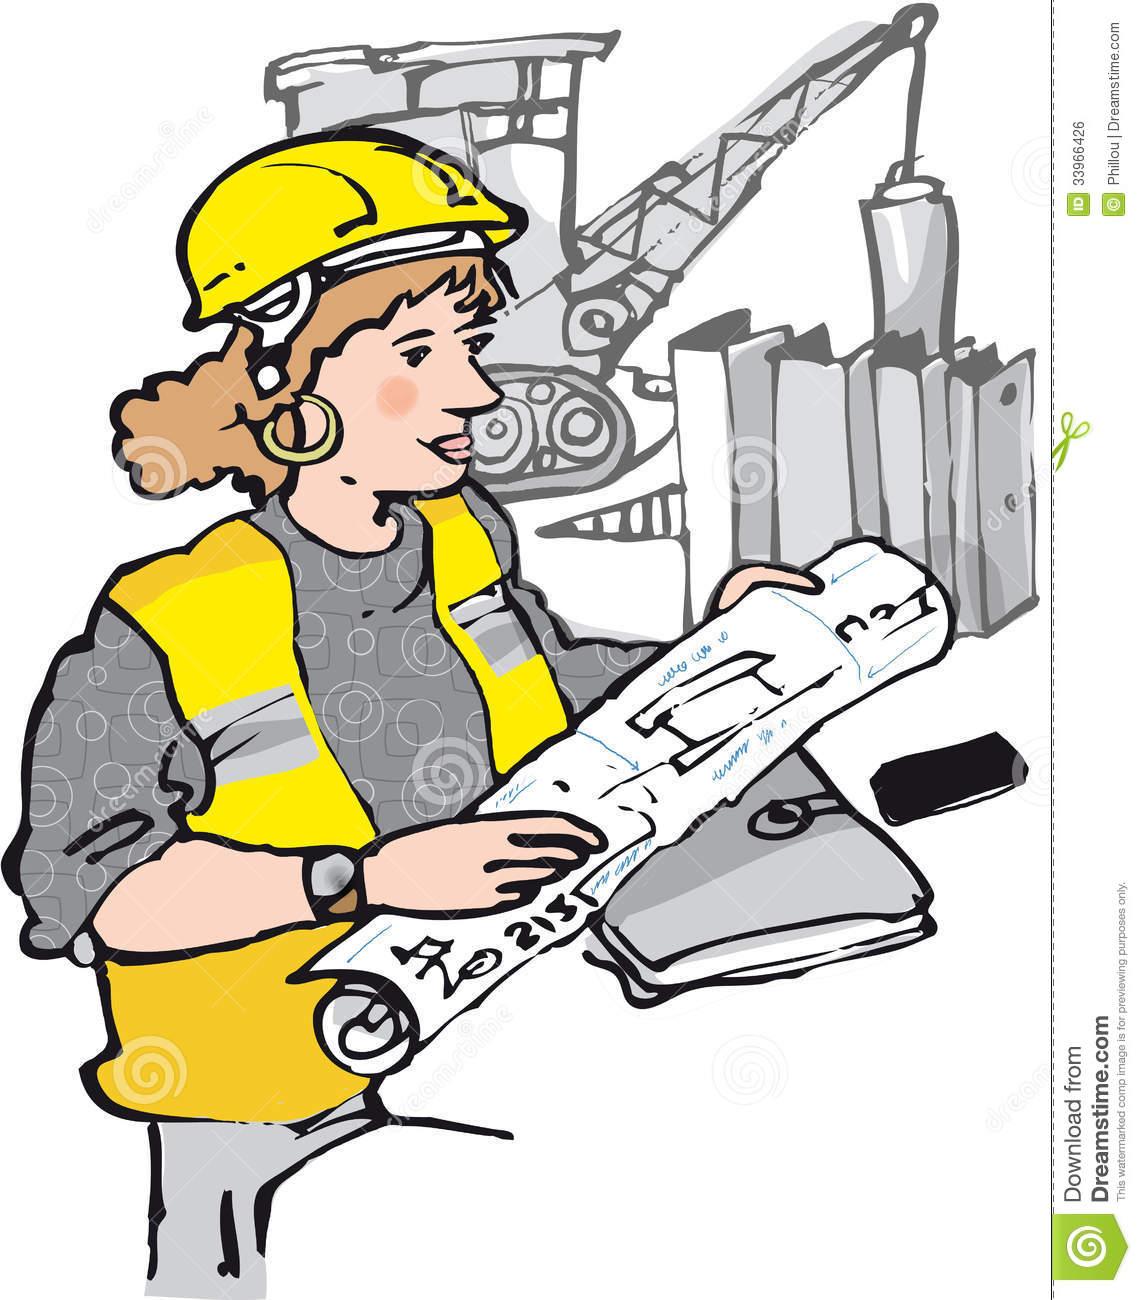 Architecture clipart civil engineer Civil Clipart clipart Clipart Engineer